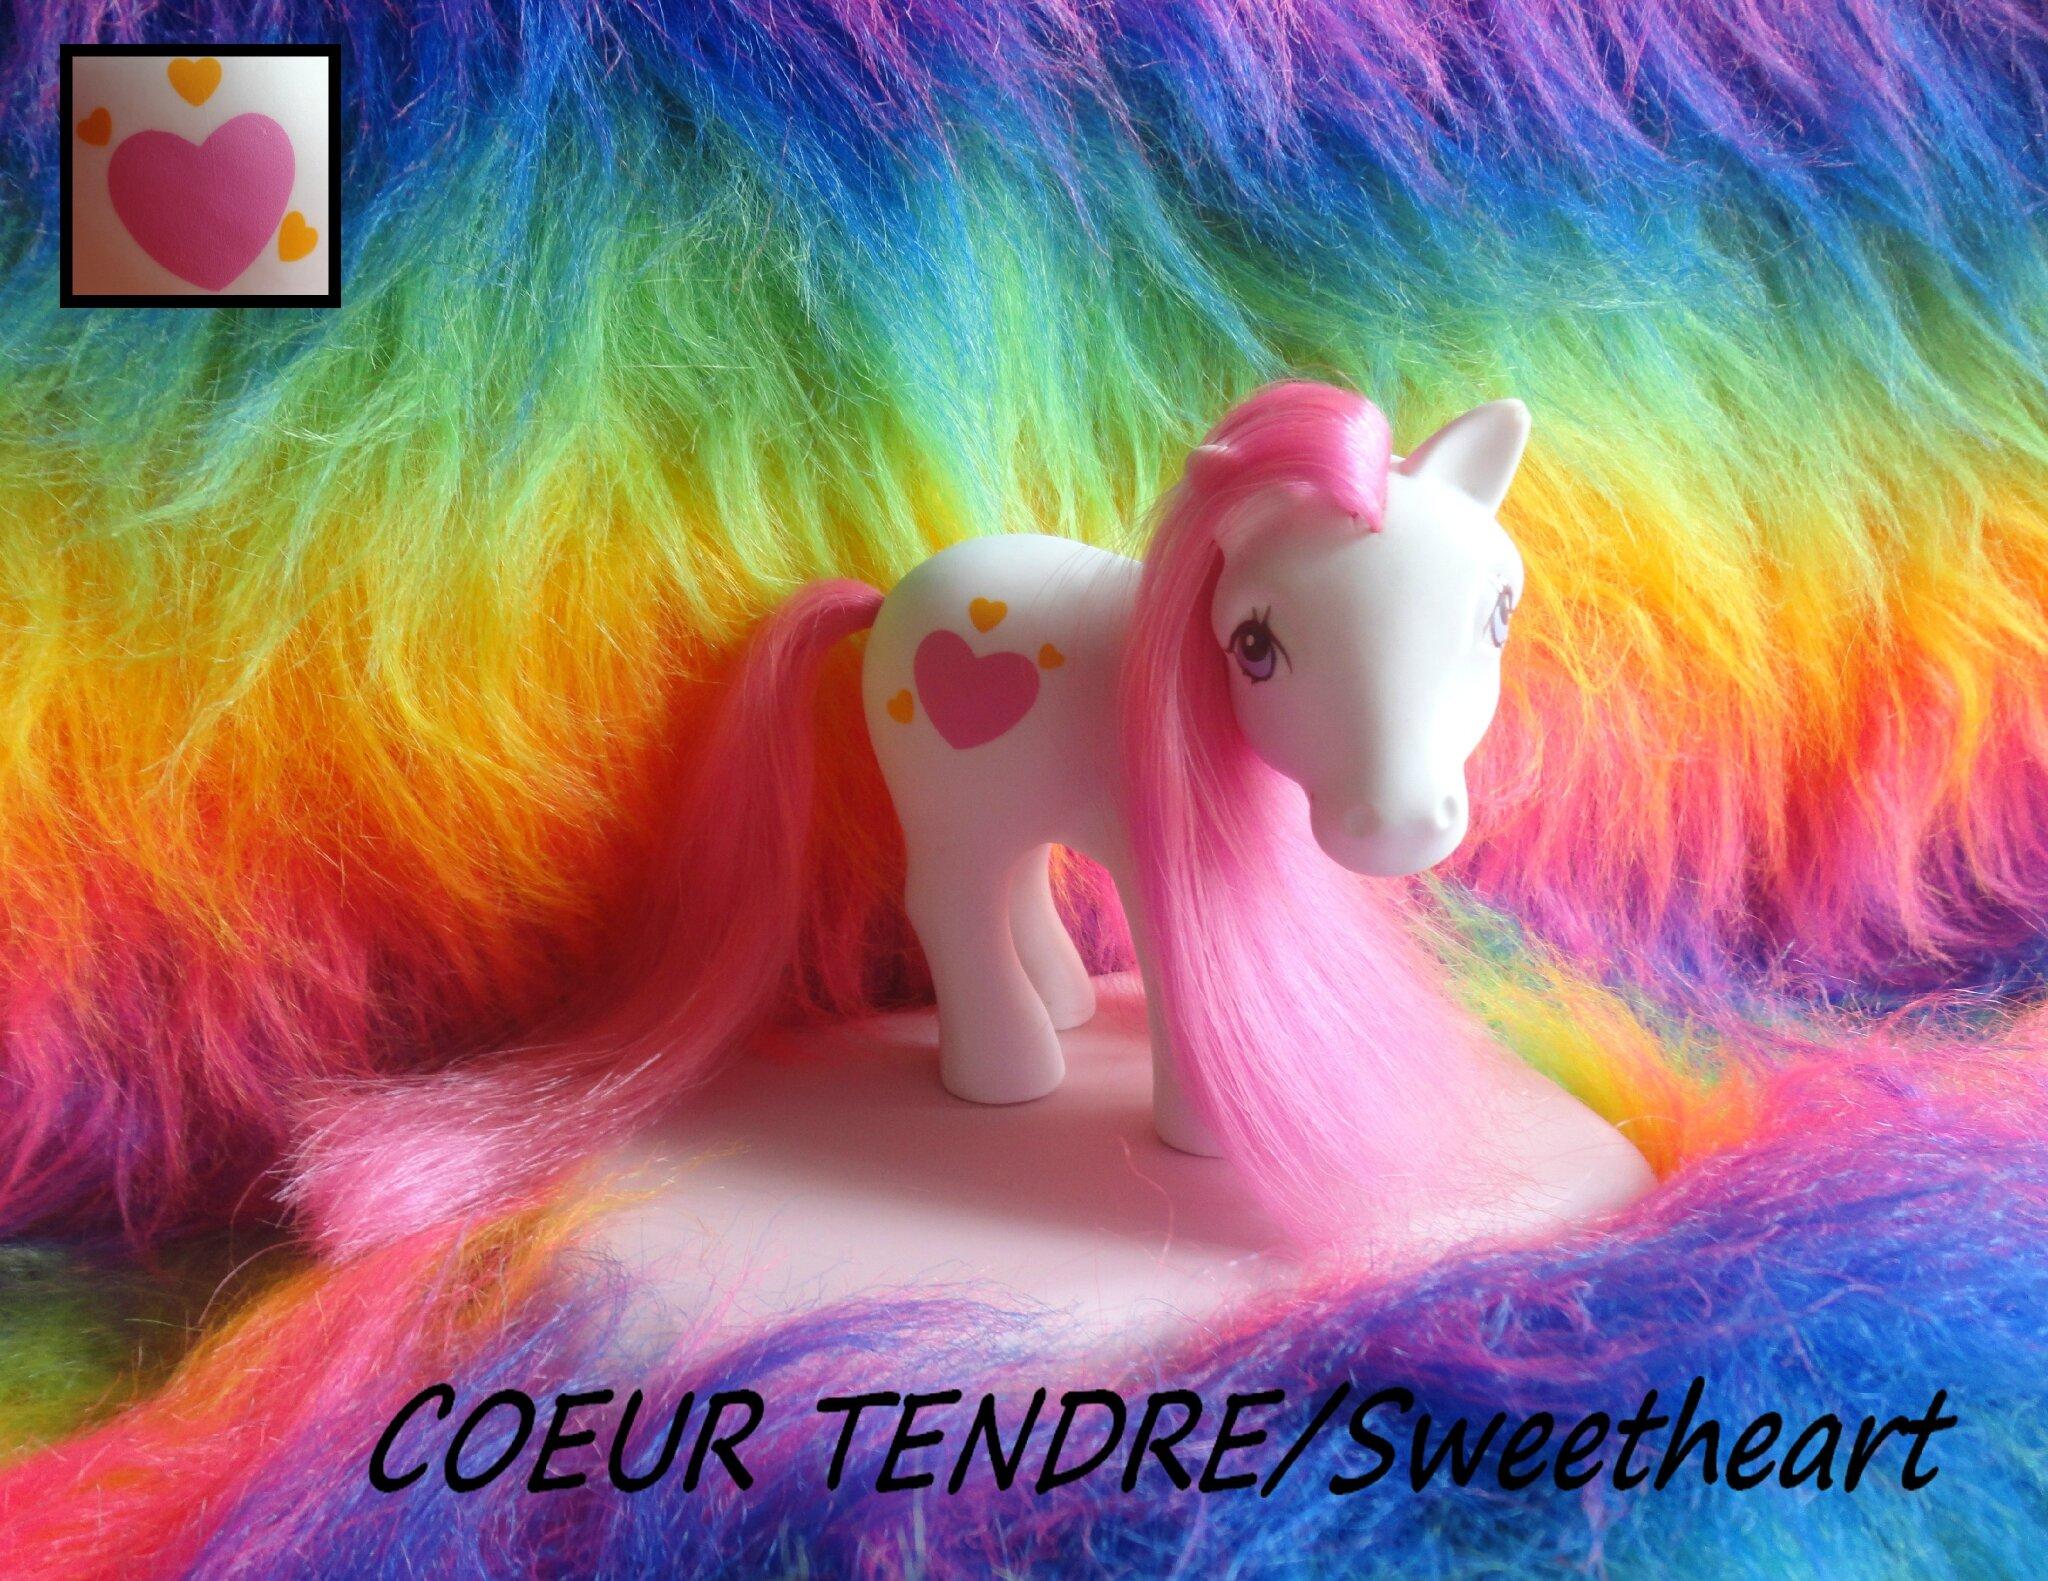 COEUR TENDRE (Sweetheart)